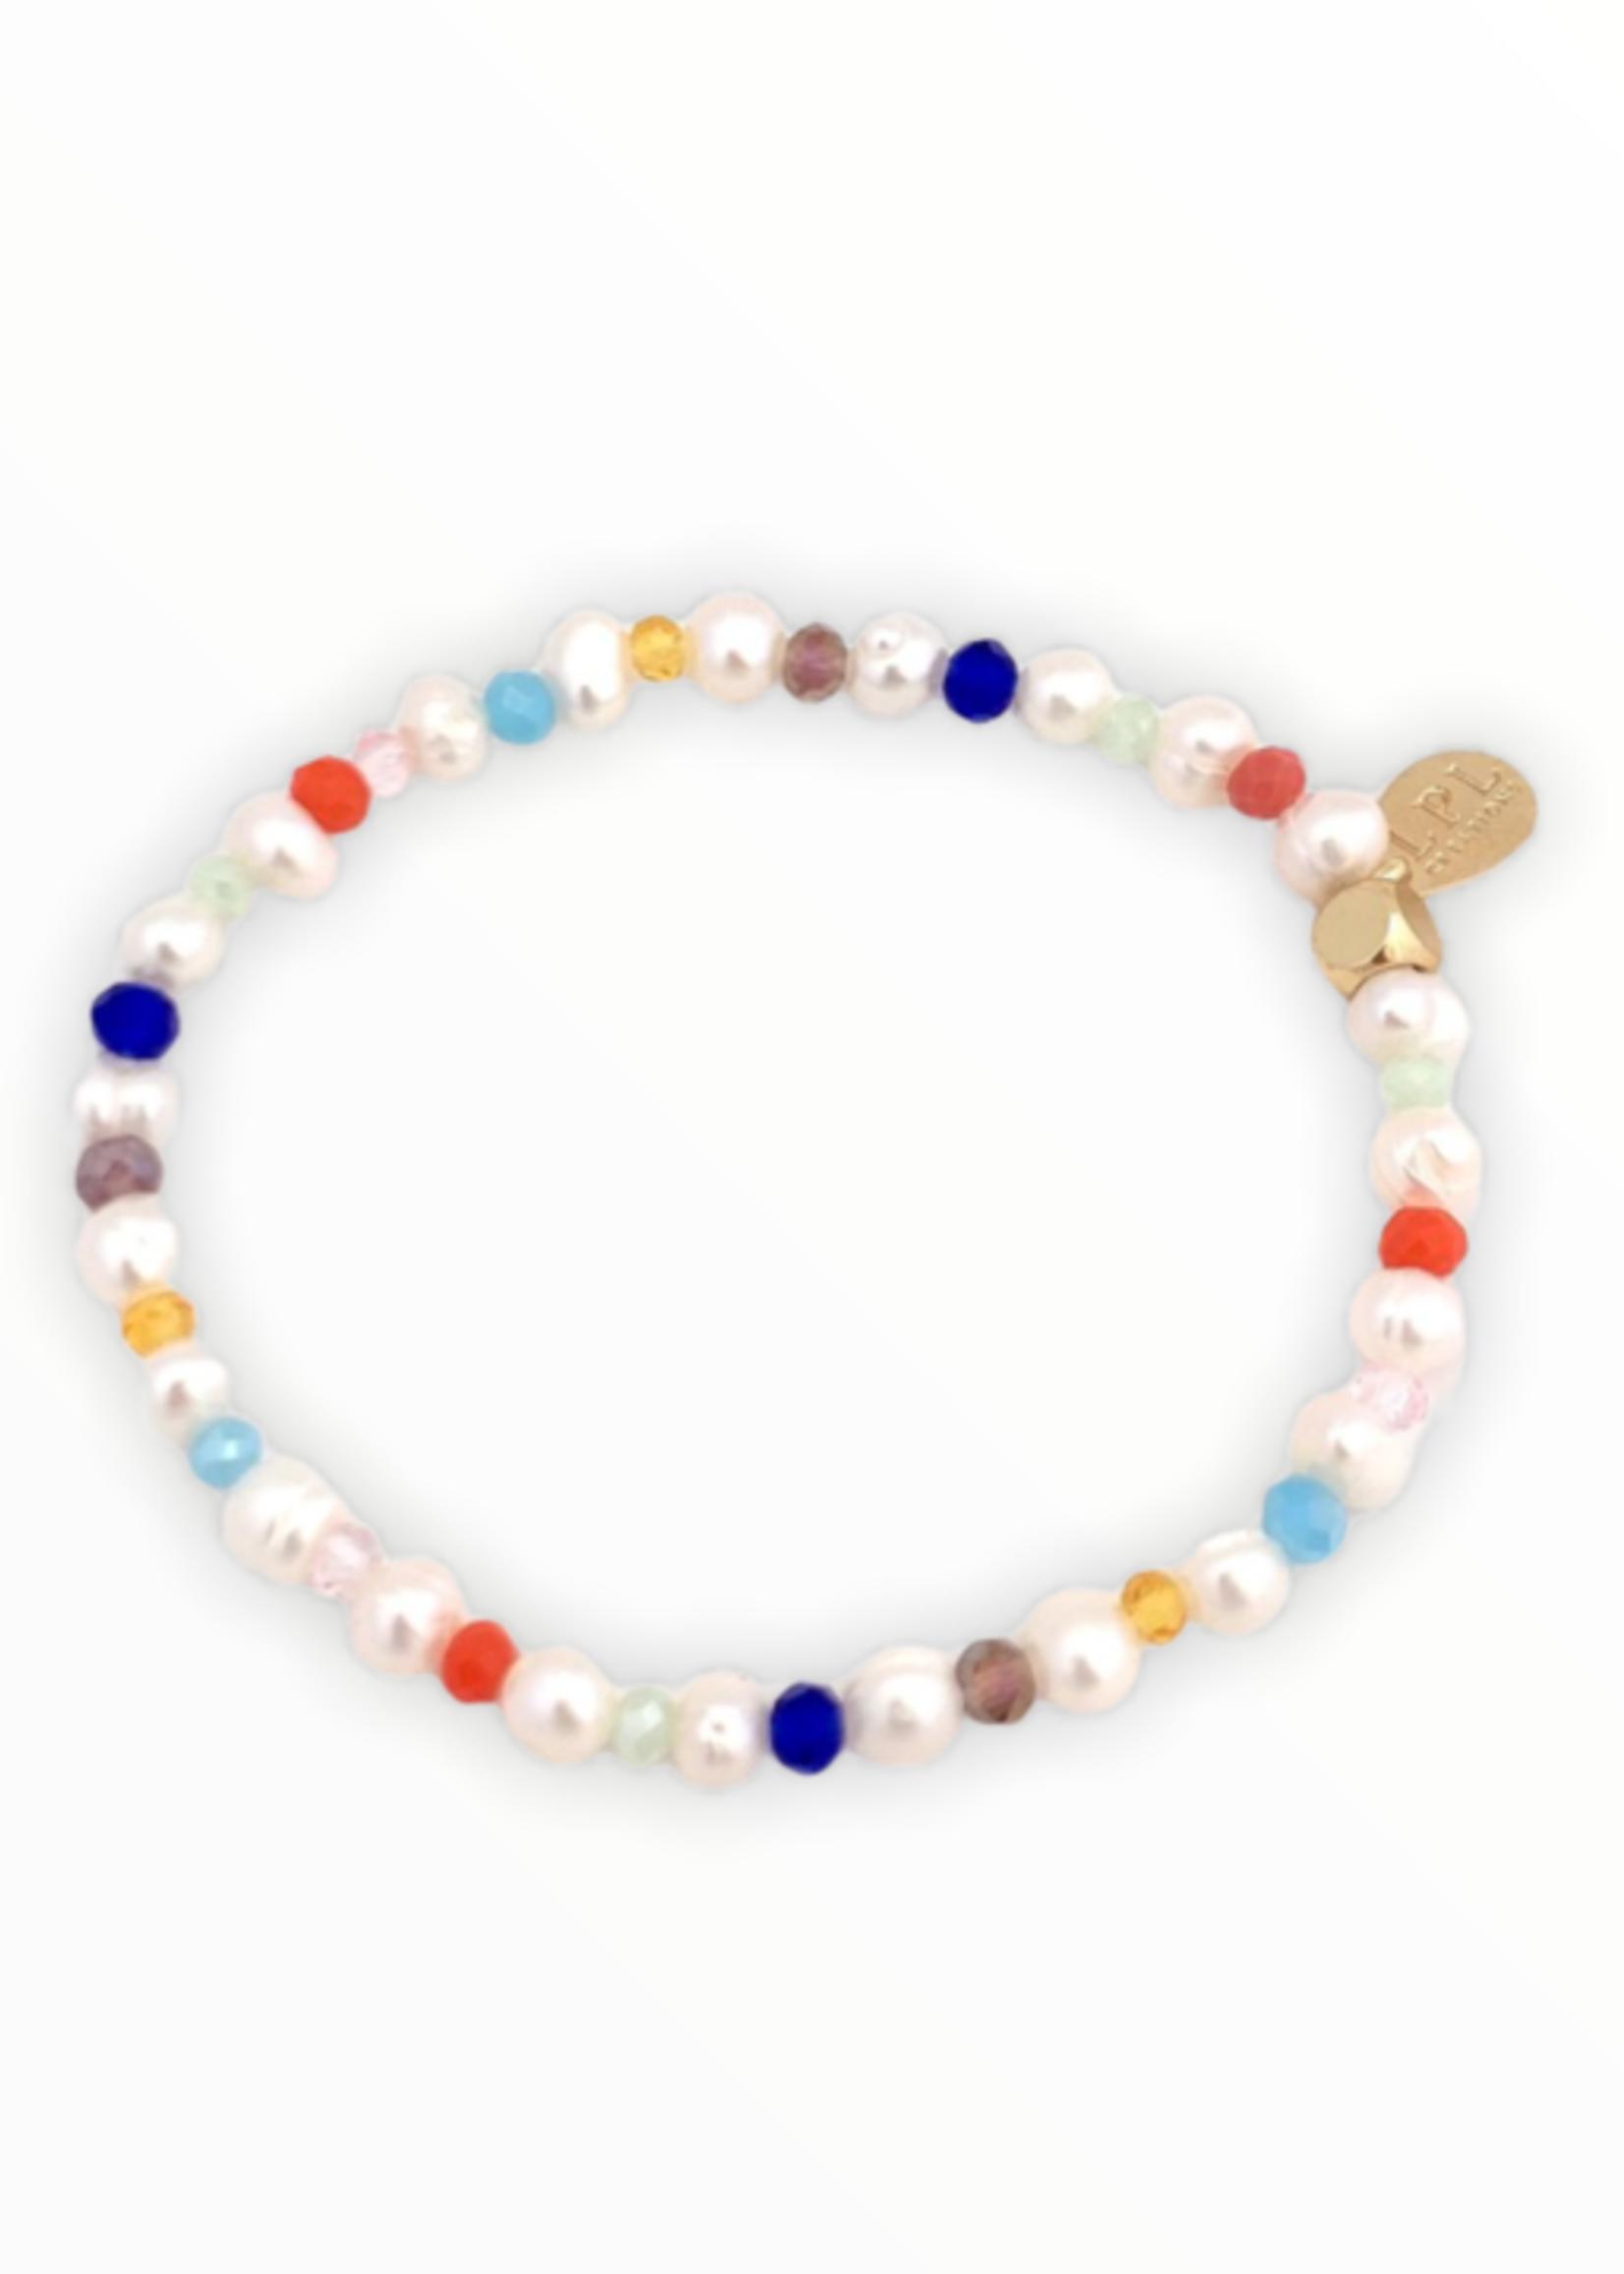 LPL Creations Soapie Bracelet in Multi